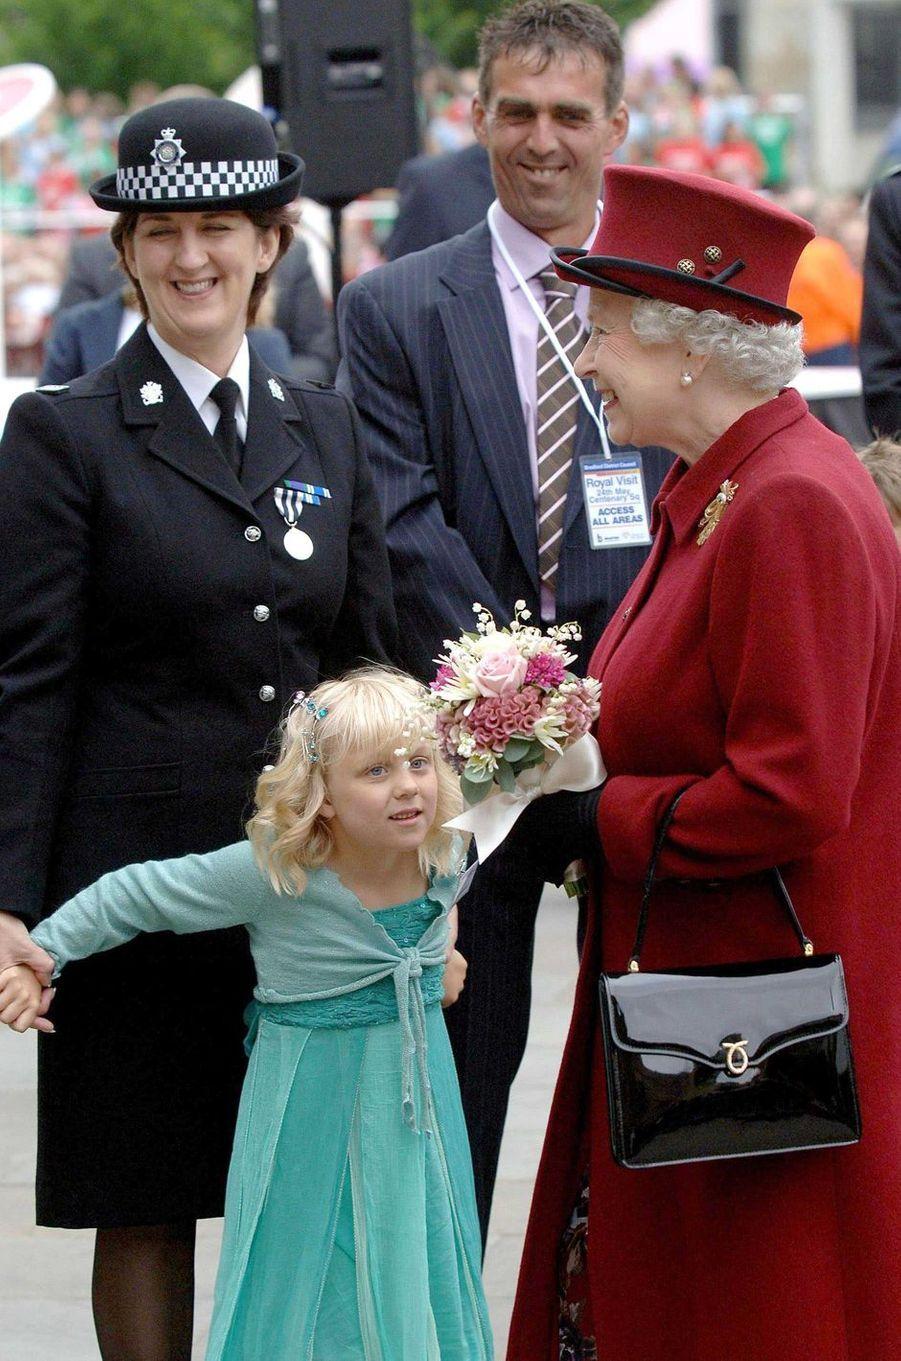 La reine Elizabeth II avec un sac Launer, le 25 mai 2007